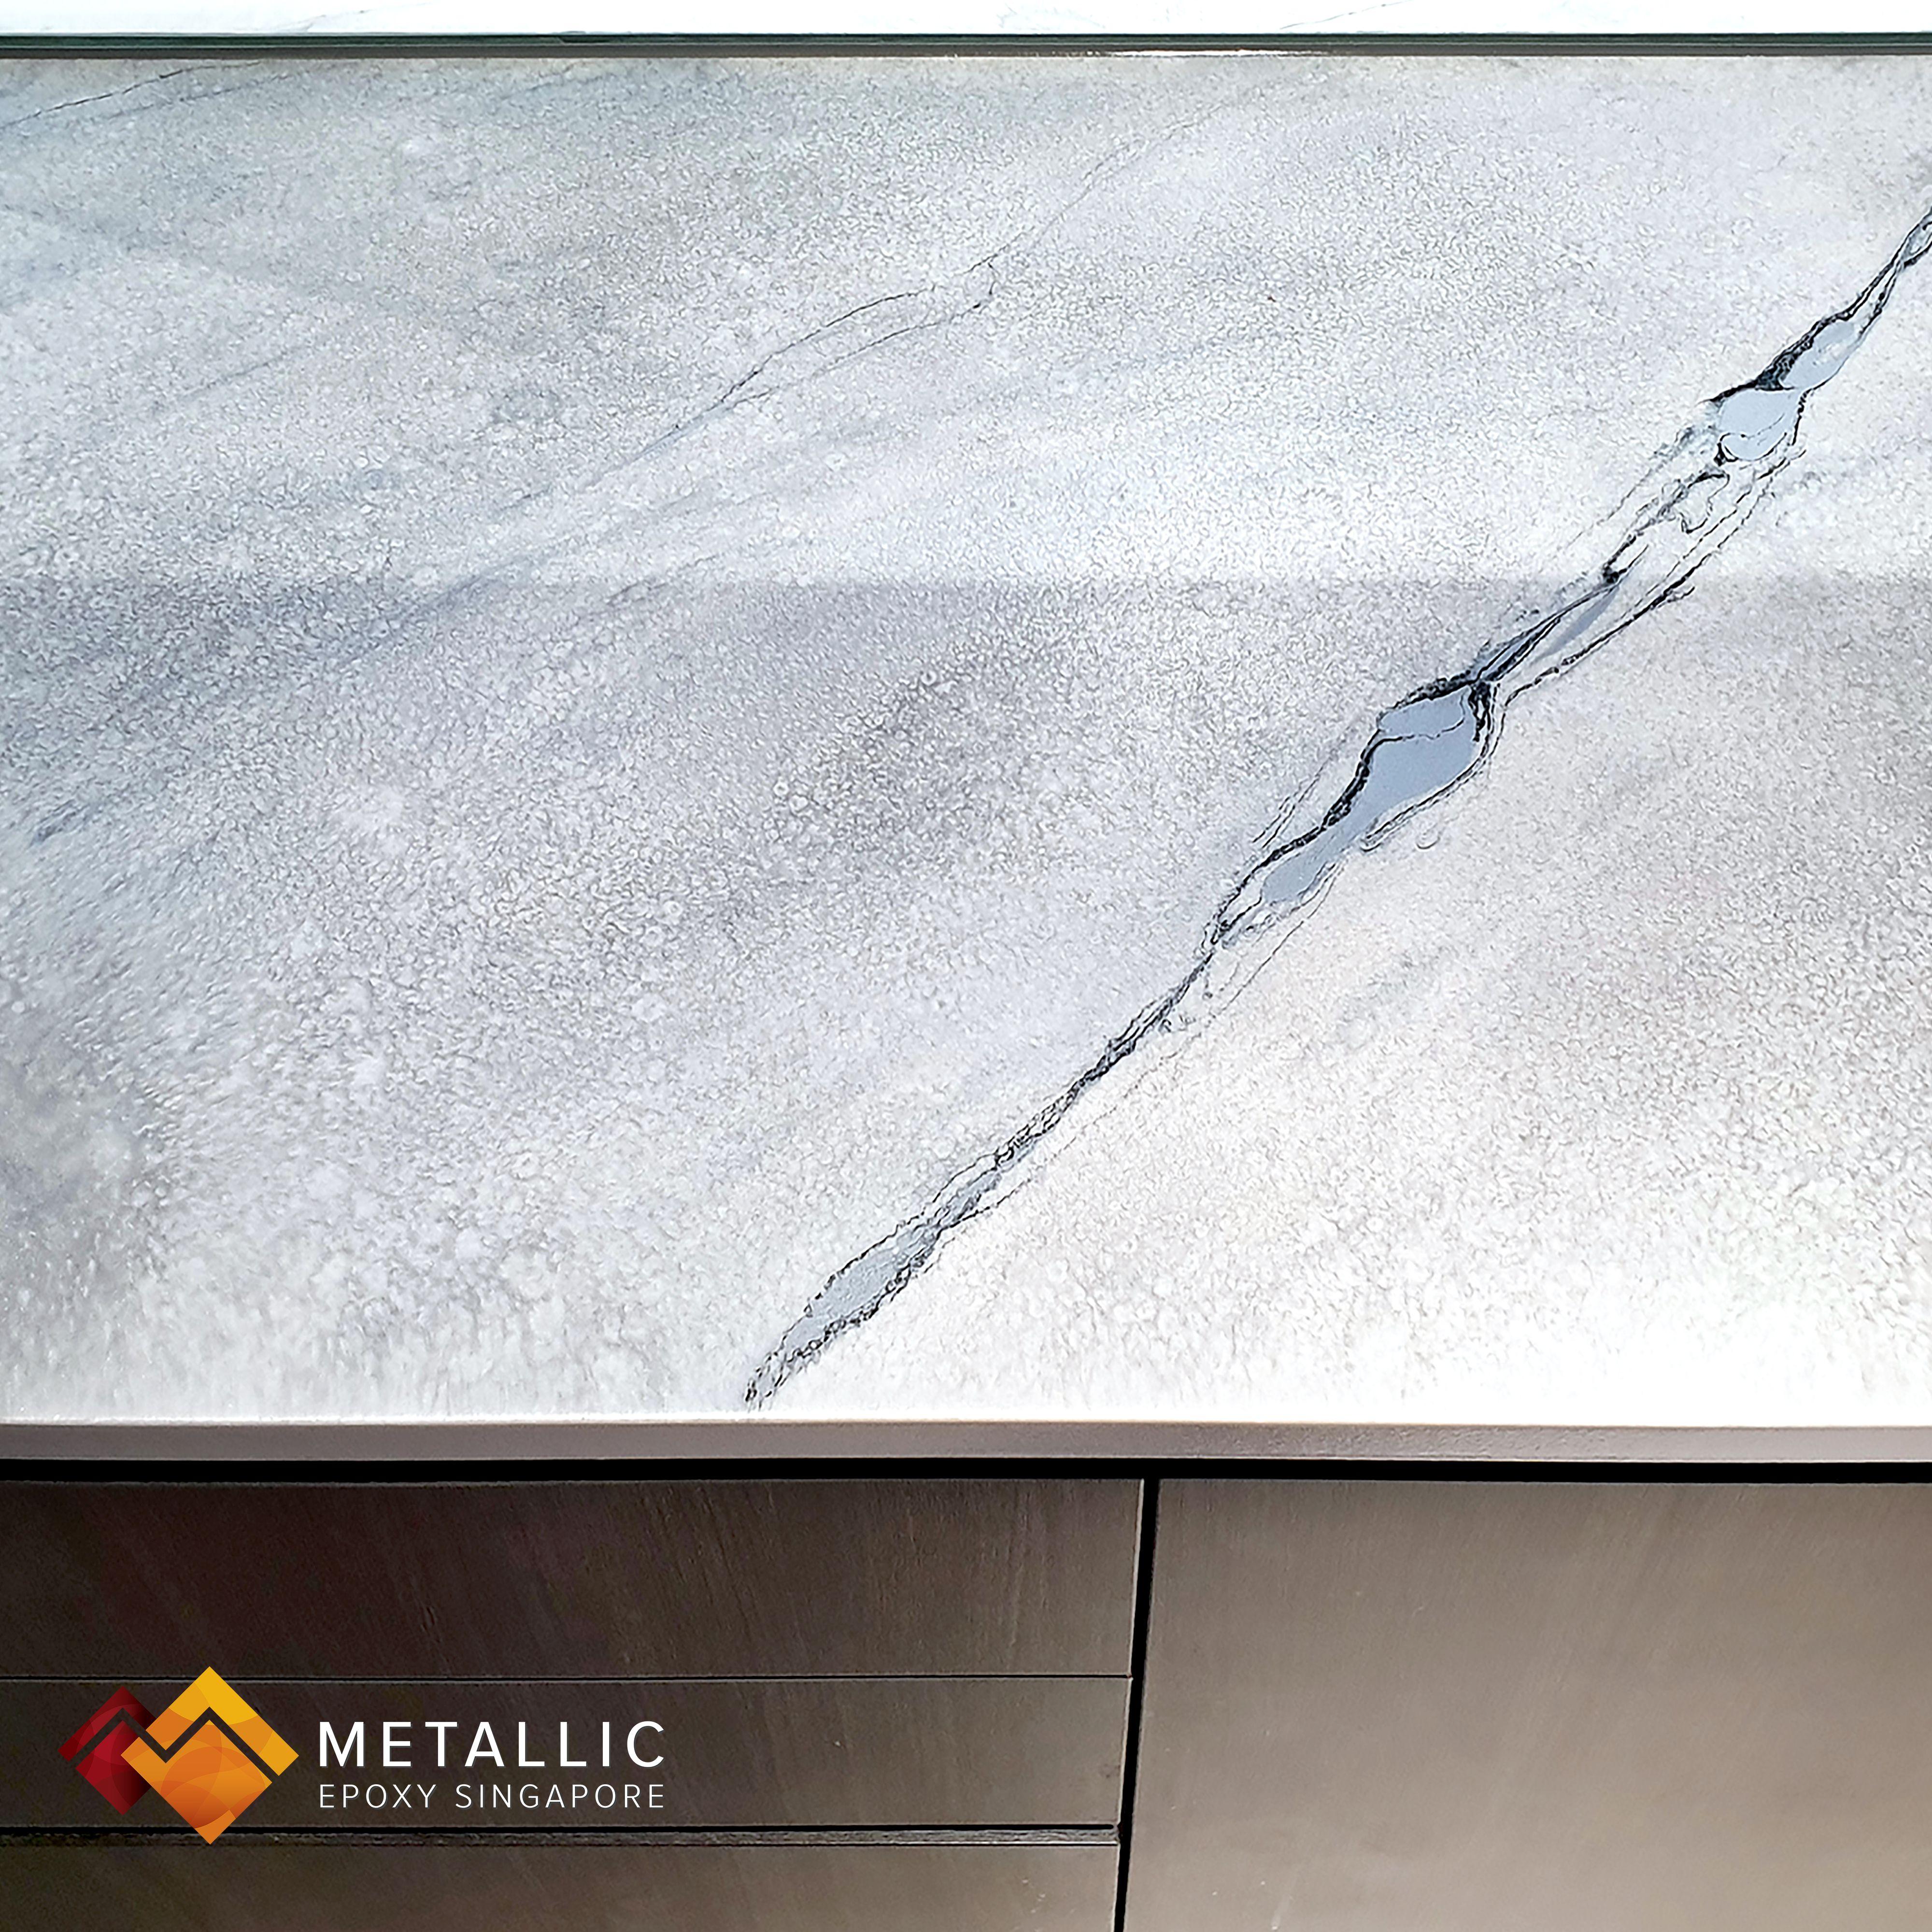 A Unique Metallic Grey Base With Black Veins To Create A Marble Theme Countertop Design For This Home Space Be Countertop Design Countertops Epoxy Countertop